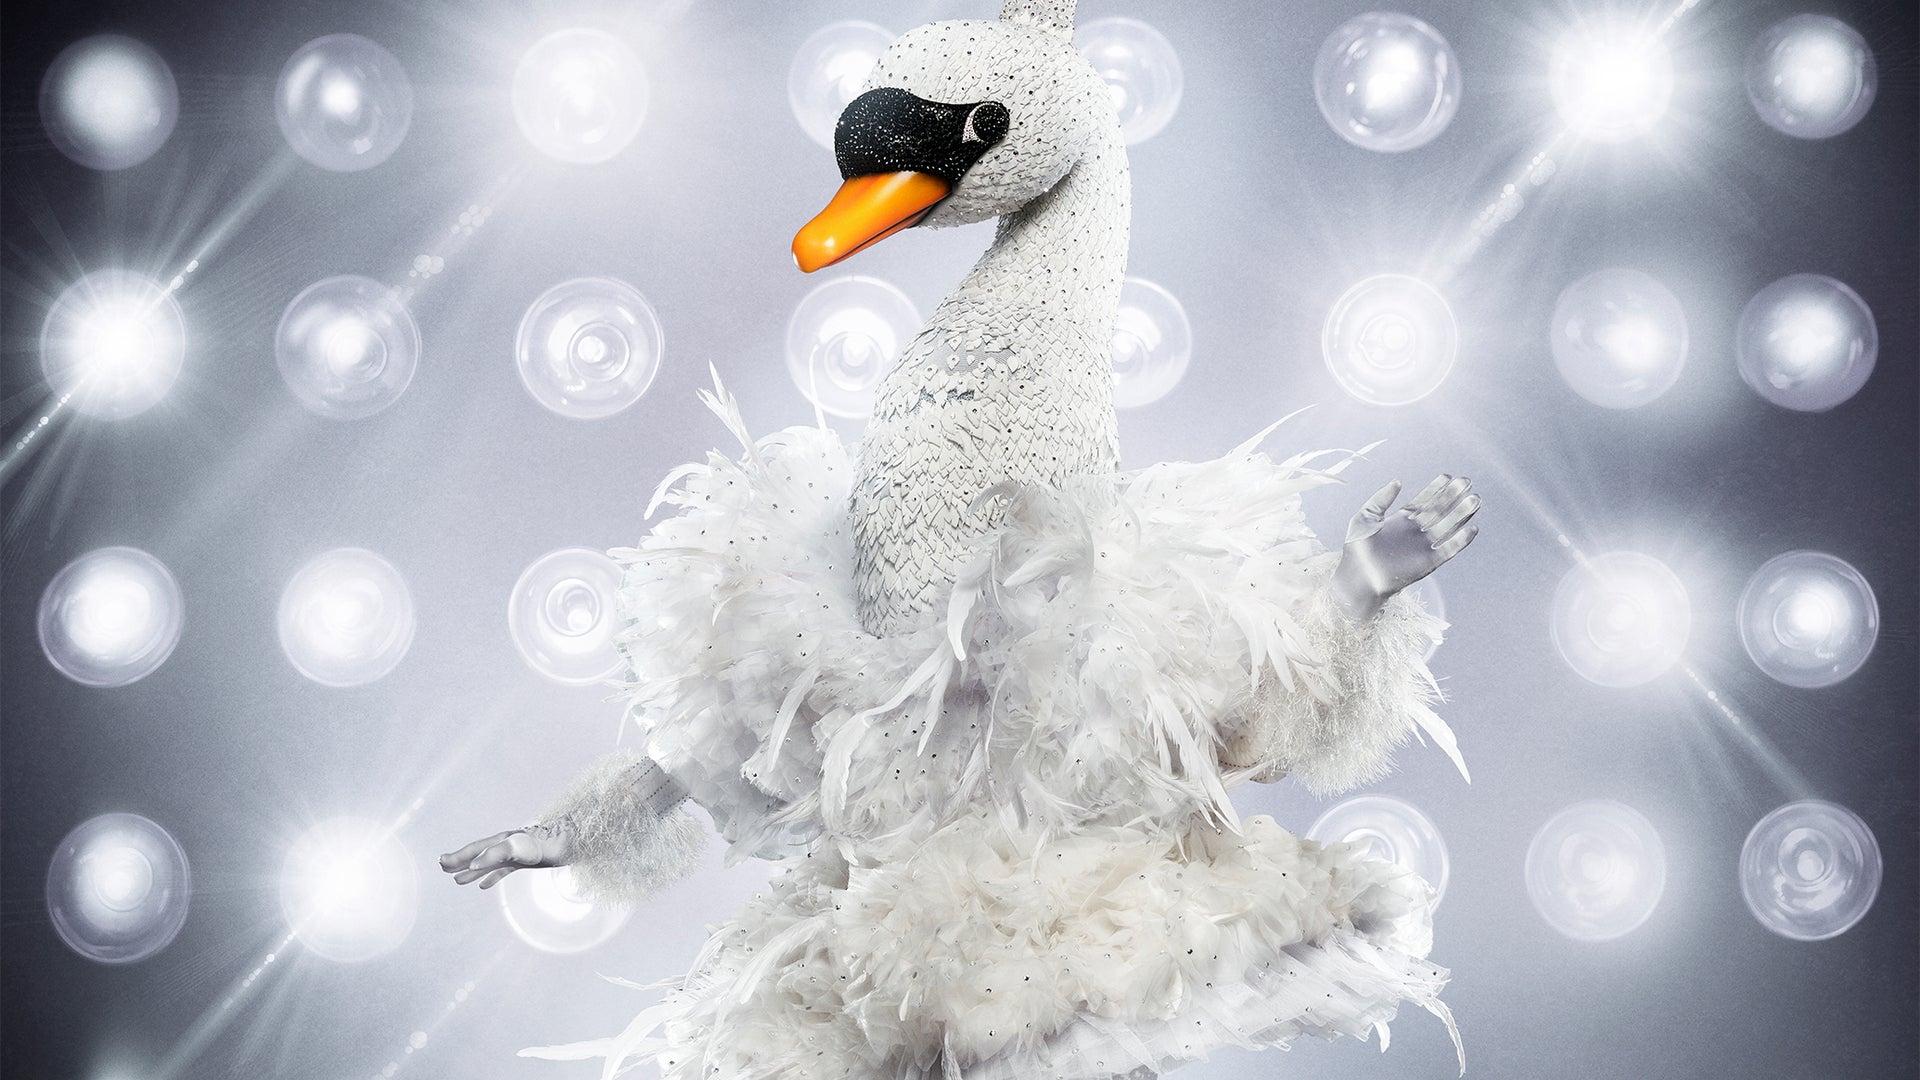 The Masked Singer, Swan